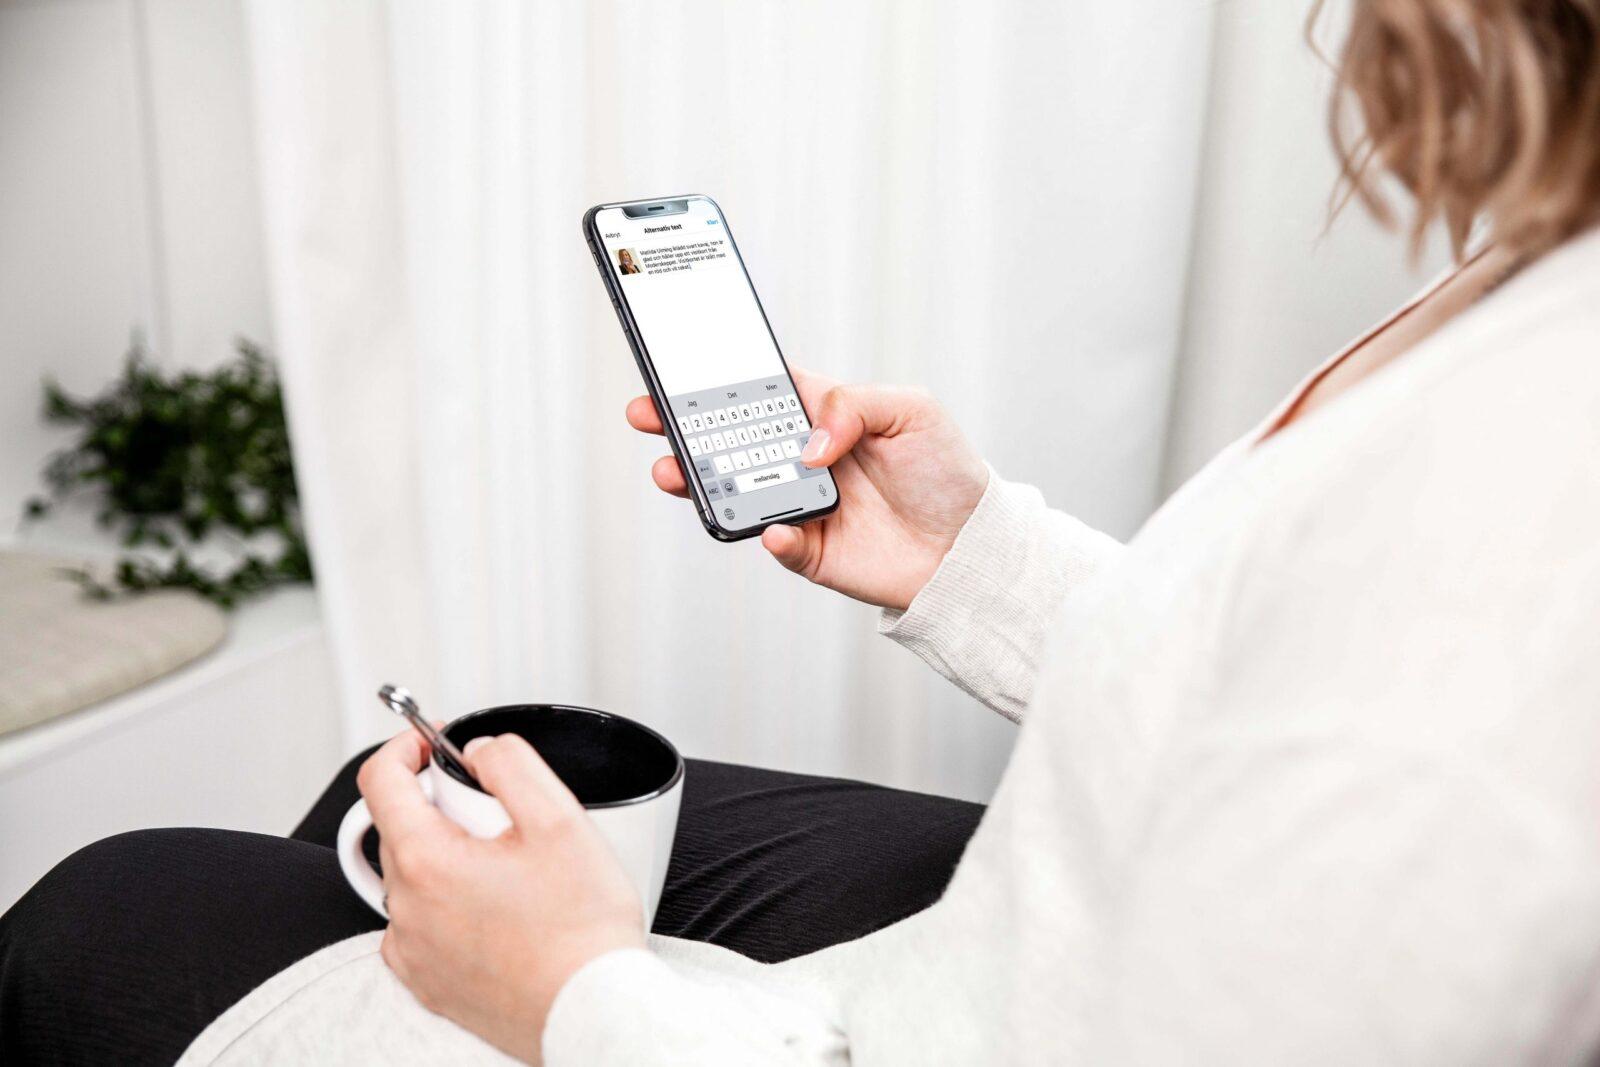 kvinna sitter med mobilen i handen, skriver alt-text på Instagram.